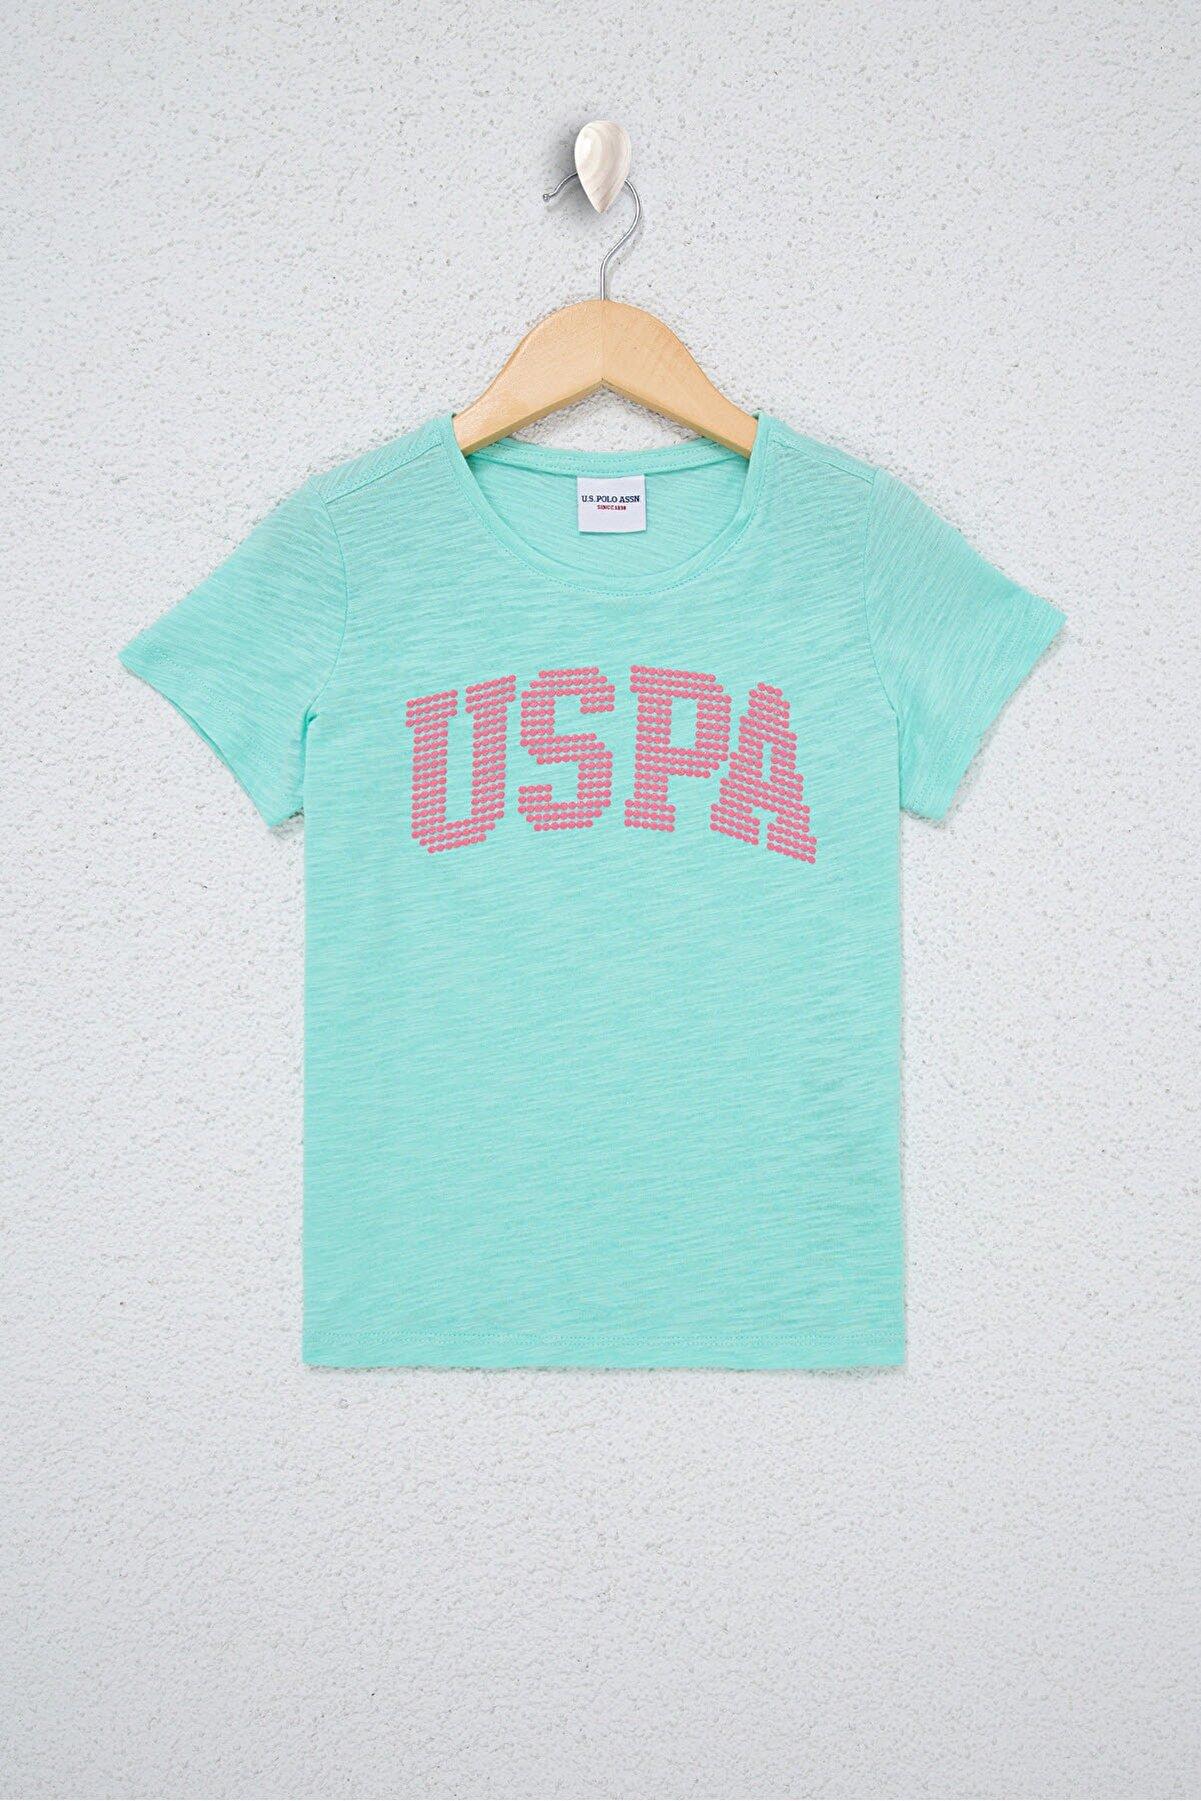 US Polo Assn Yesıl Kız Çocuk T-Shirt